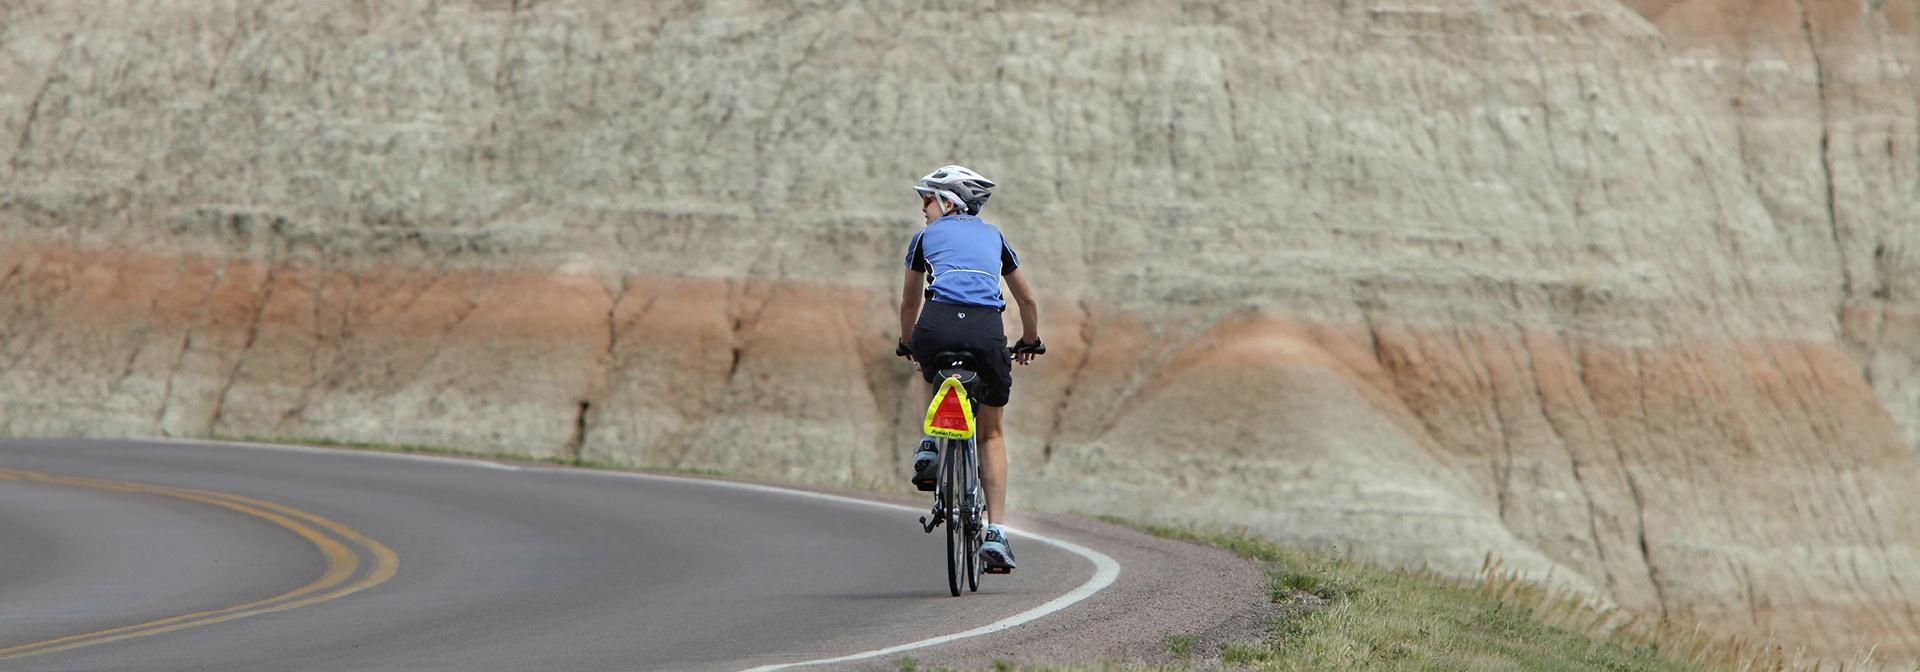 Susan on the South Dakota bike tour